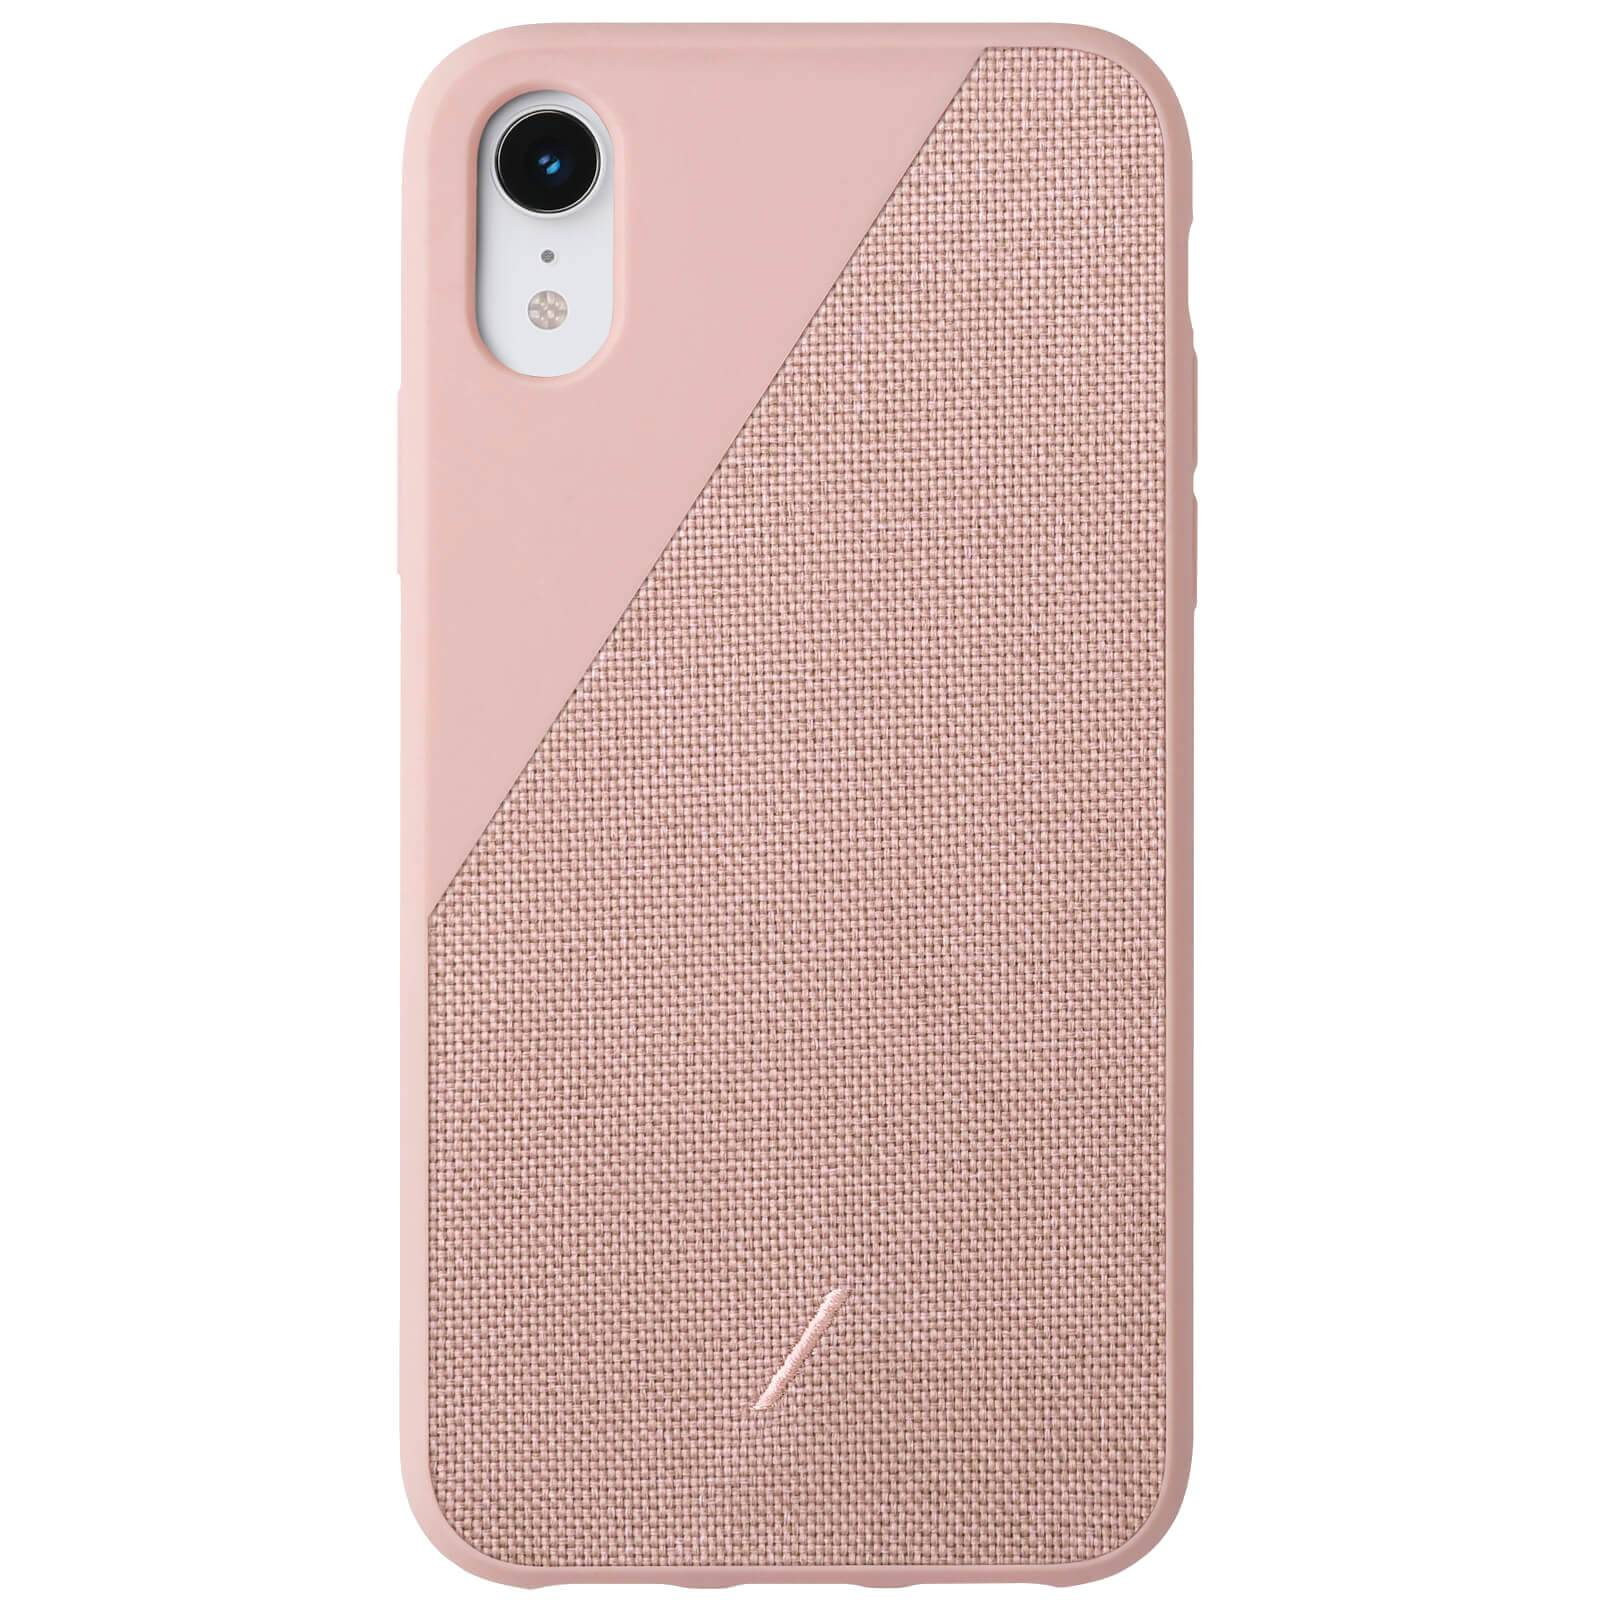 Native Union Clic Canvas iPhone XR Case - Rose